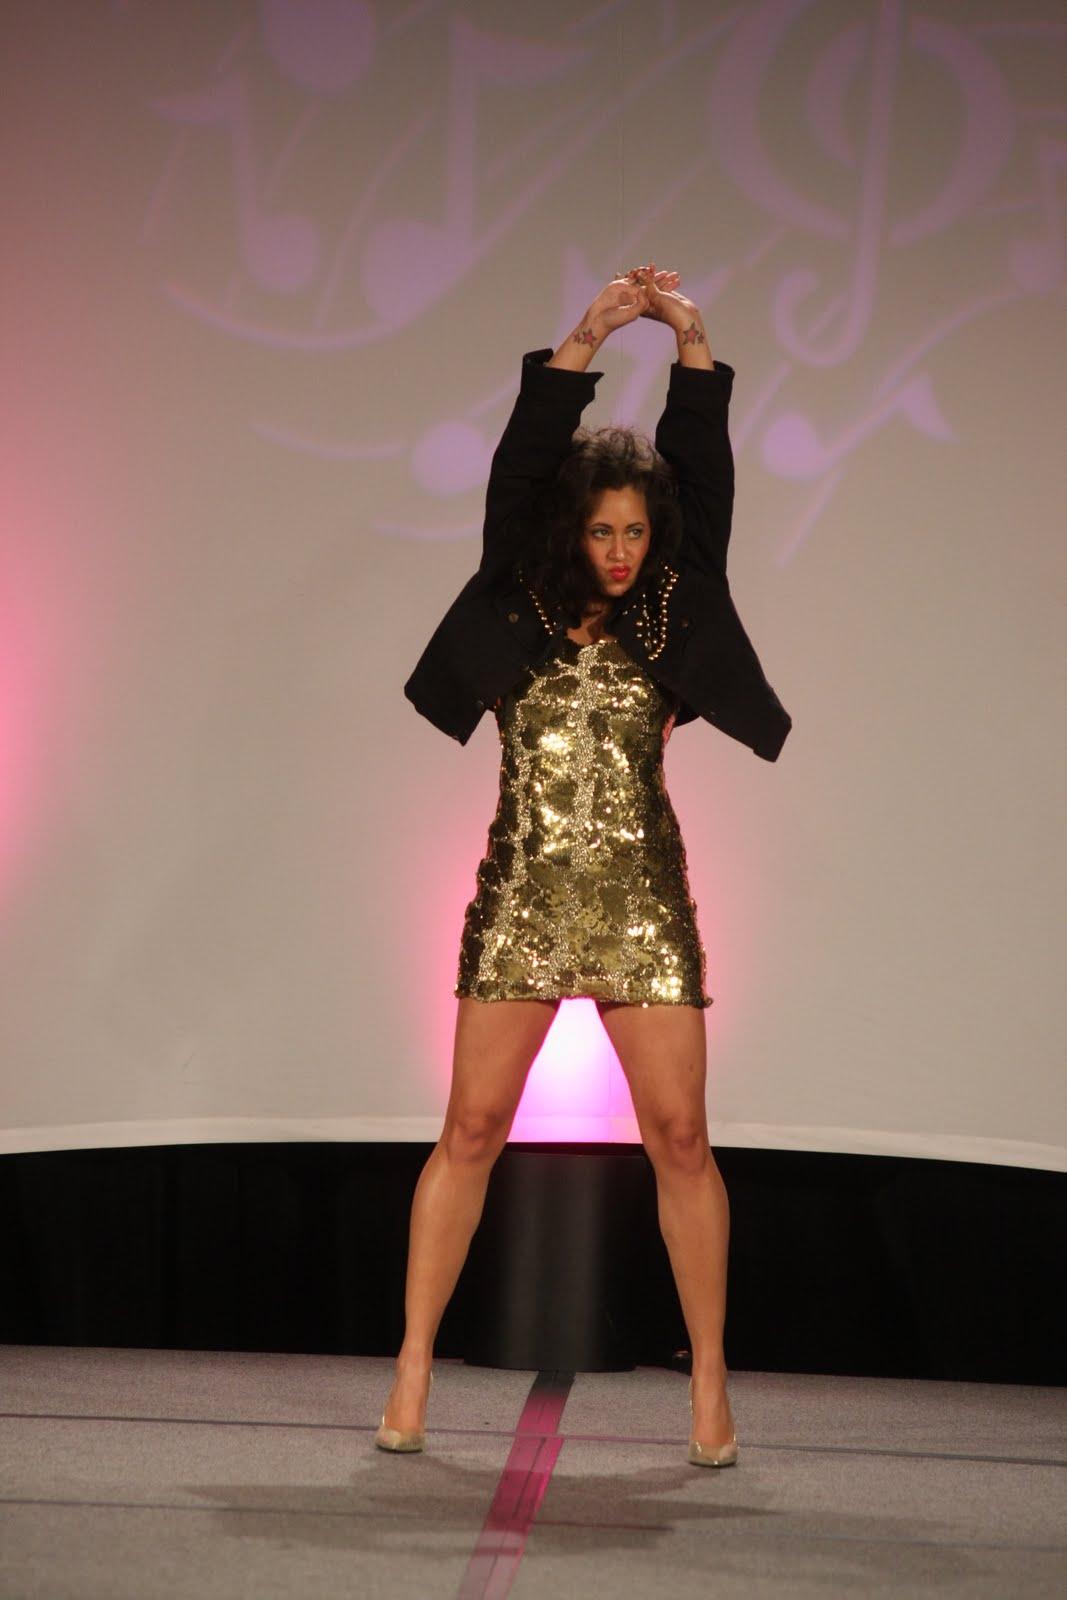 http://2.bp.blogspot.com/-PYWR263p3ls/T4wdcUMFUkI/AAAAAAAAQjg/1p0G3IYM5u4/s1600/Tina_Turner_1.JPG